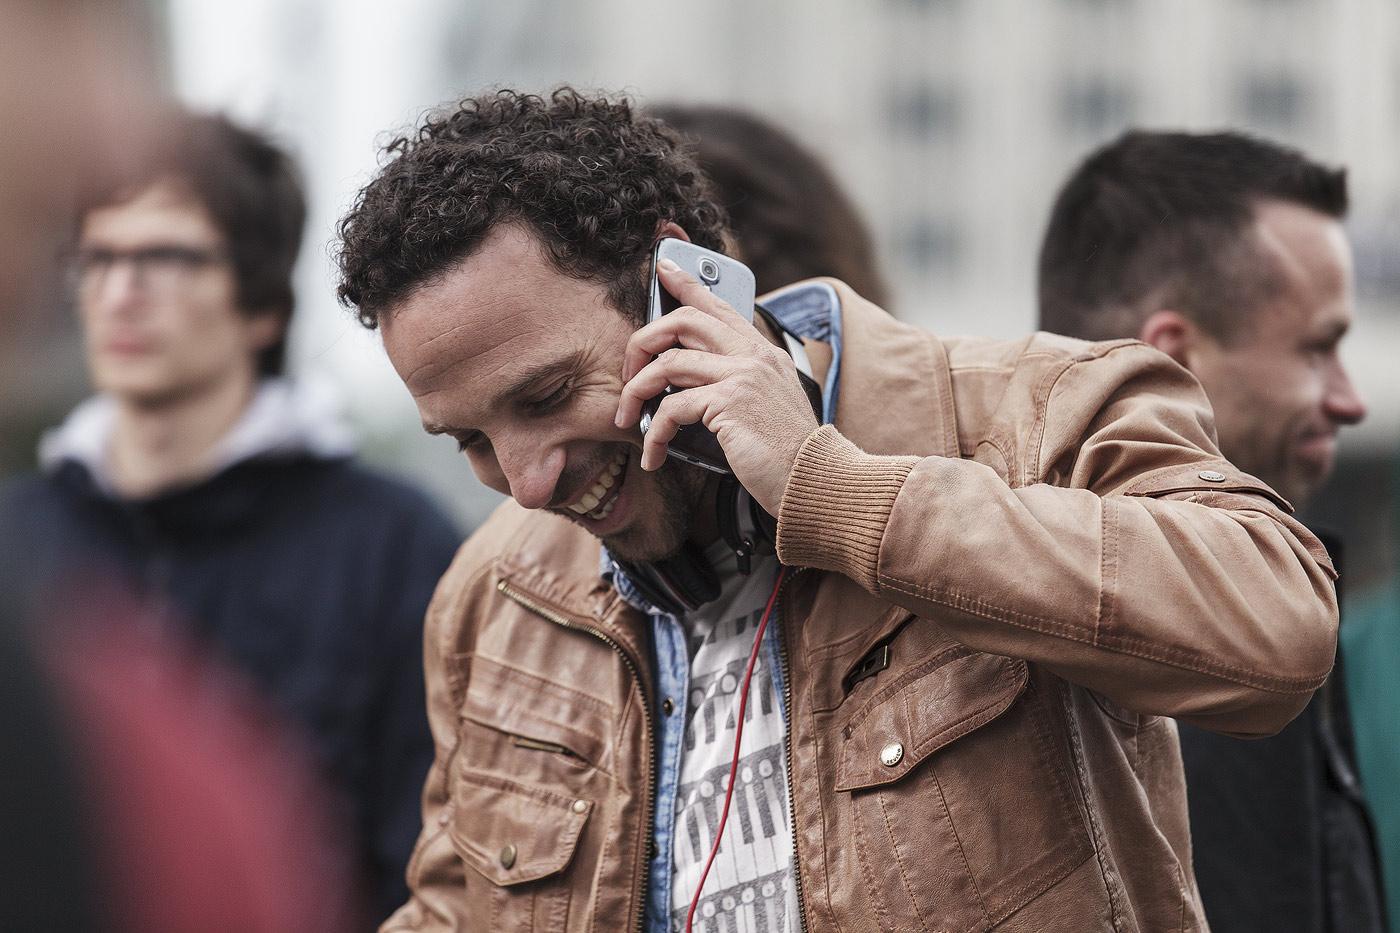 mann-handy-telefon-stadt